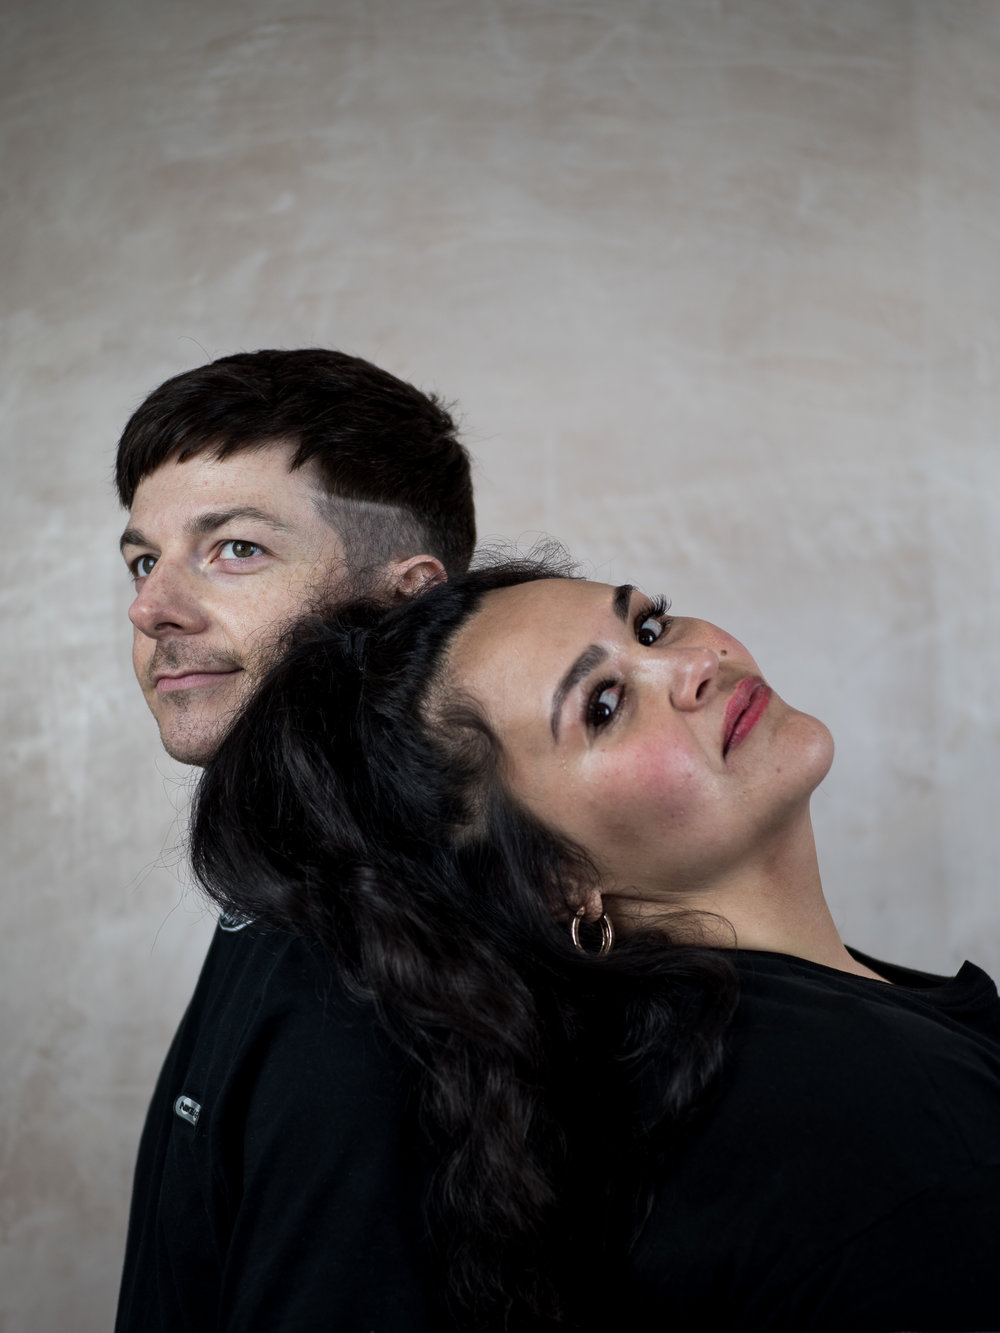 Bossy Love duo portrait (credit C.Campbell).jpg